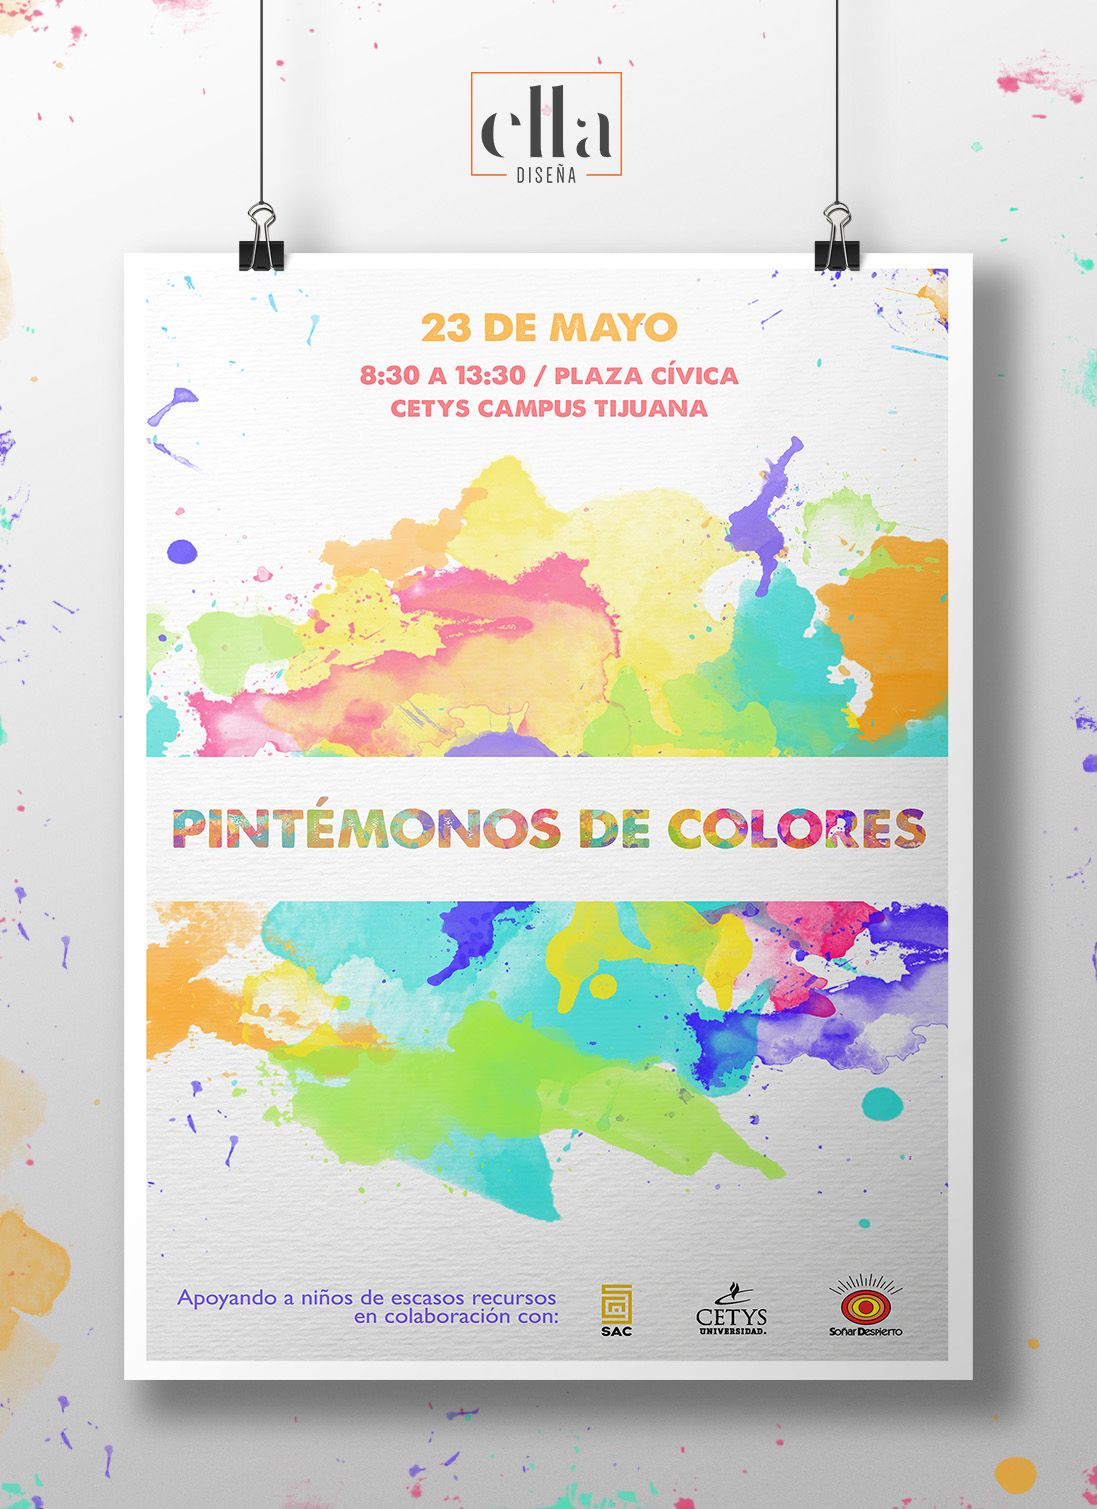 Pintémonos de colores on Behance